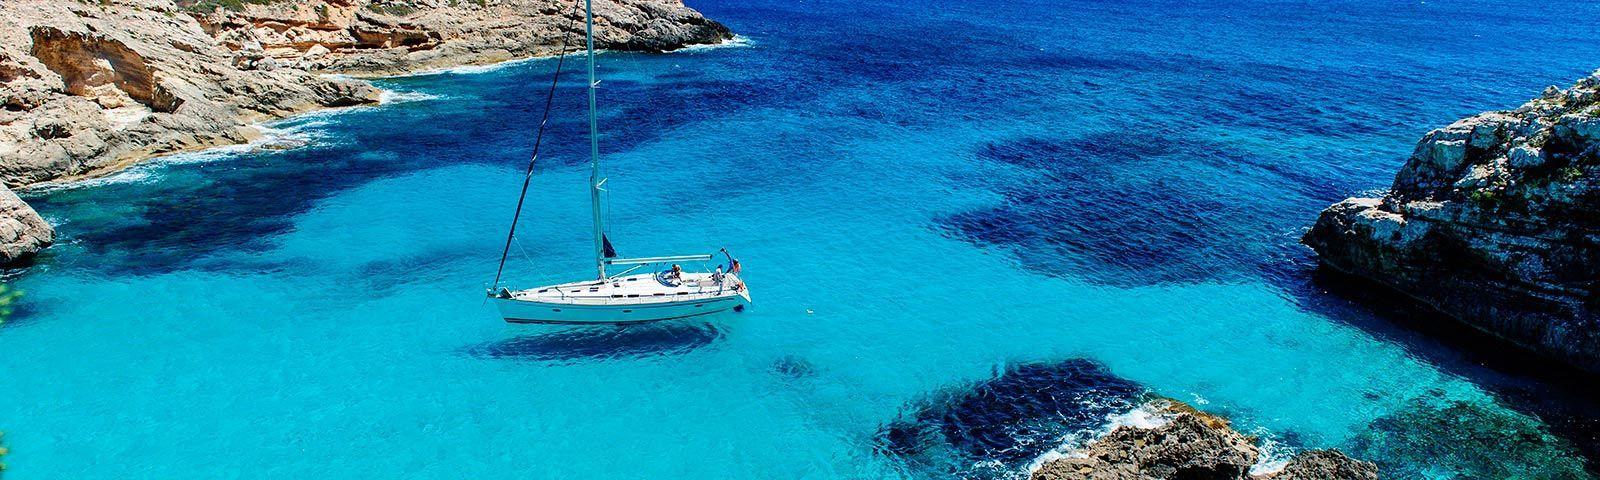 vacaciones-velero-islas-baleares-cala-mallorca